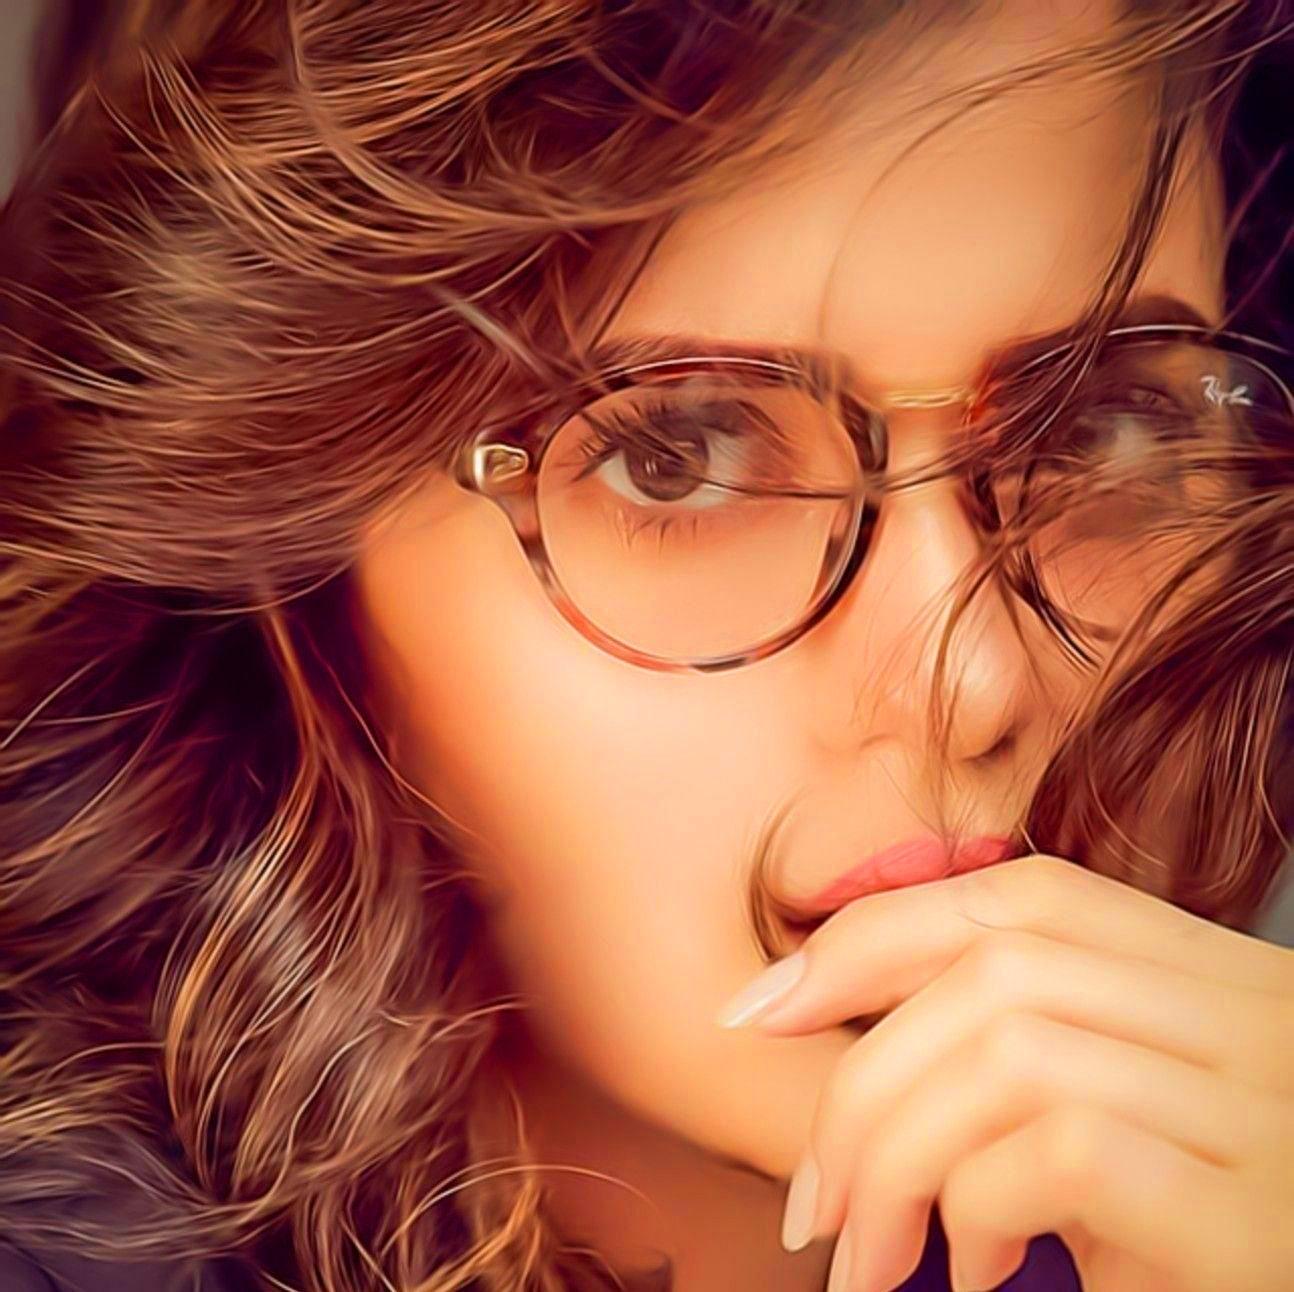 girl Latest Whatsapp Profile Images photo free hd 1